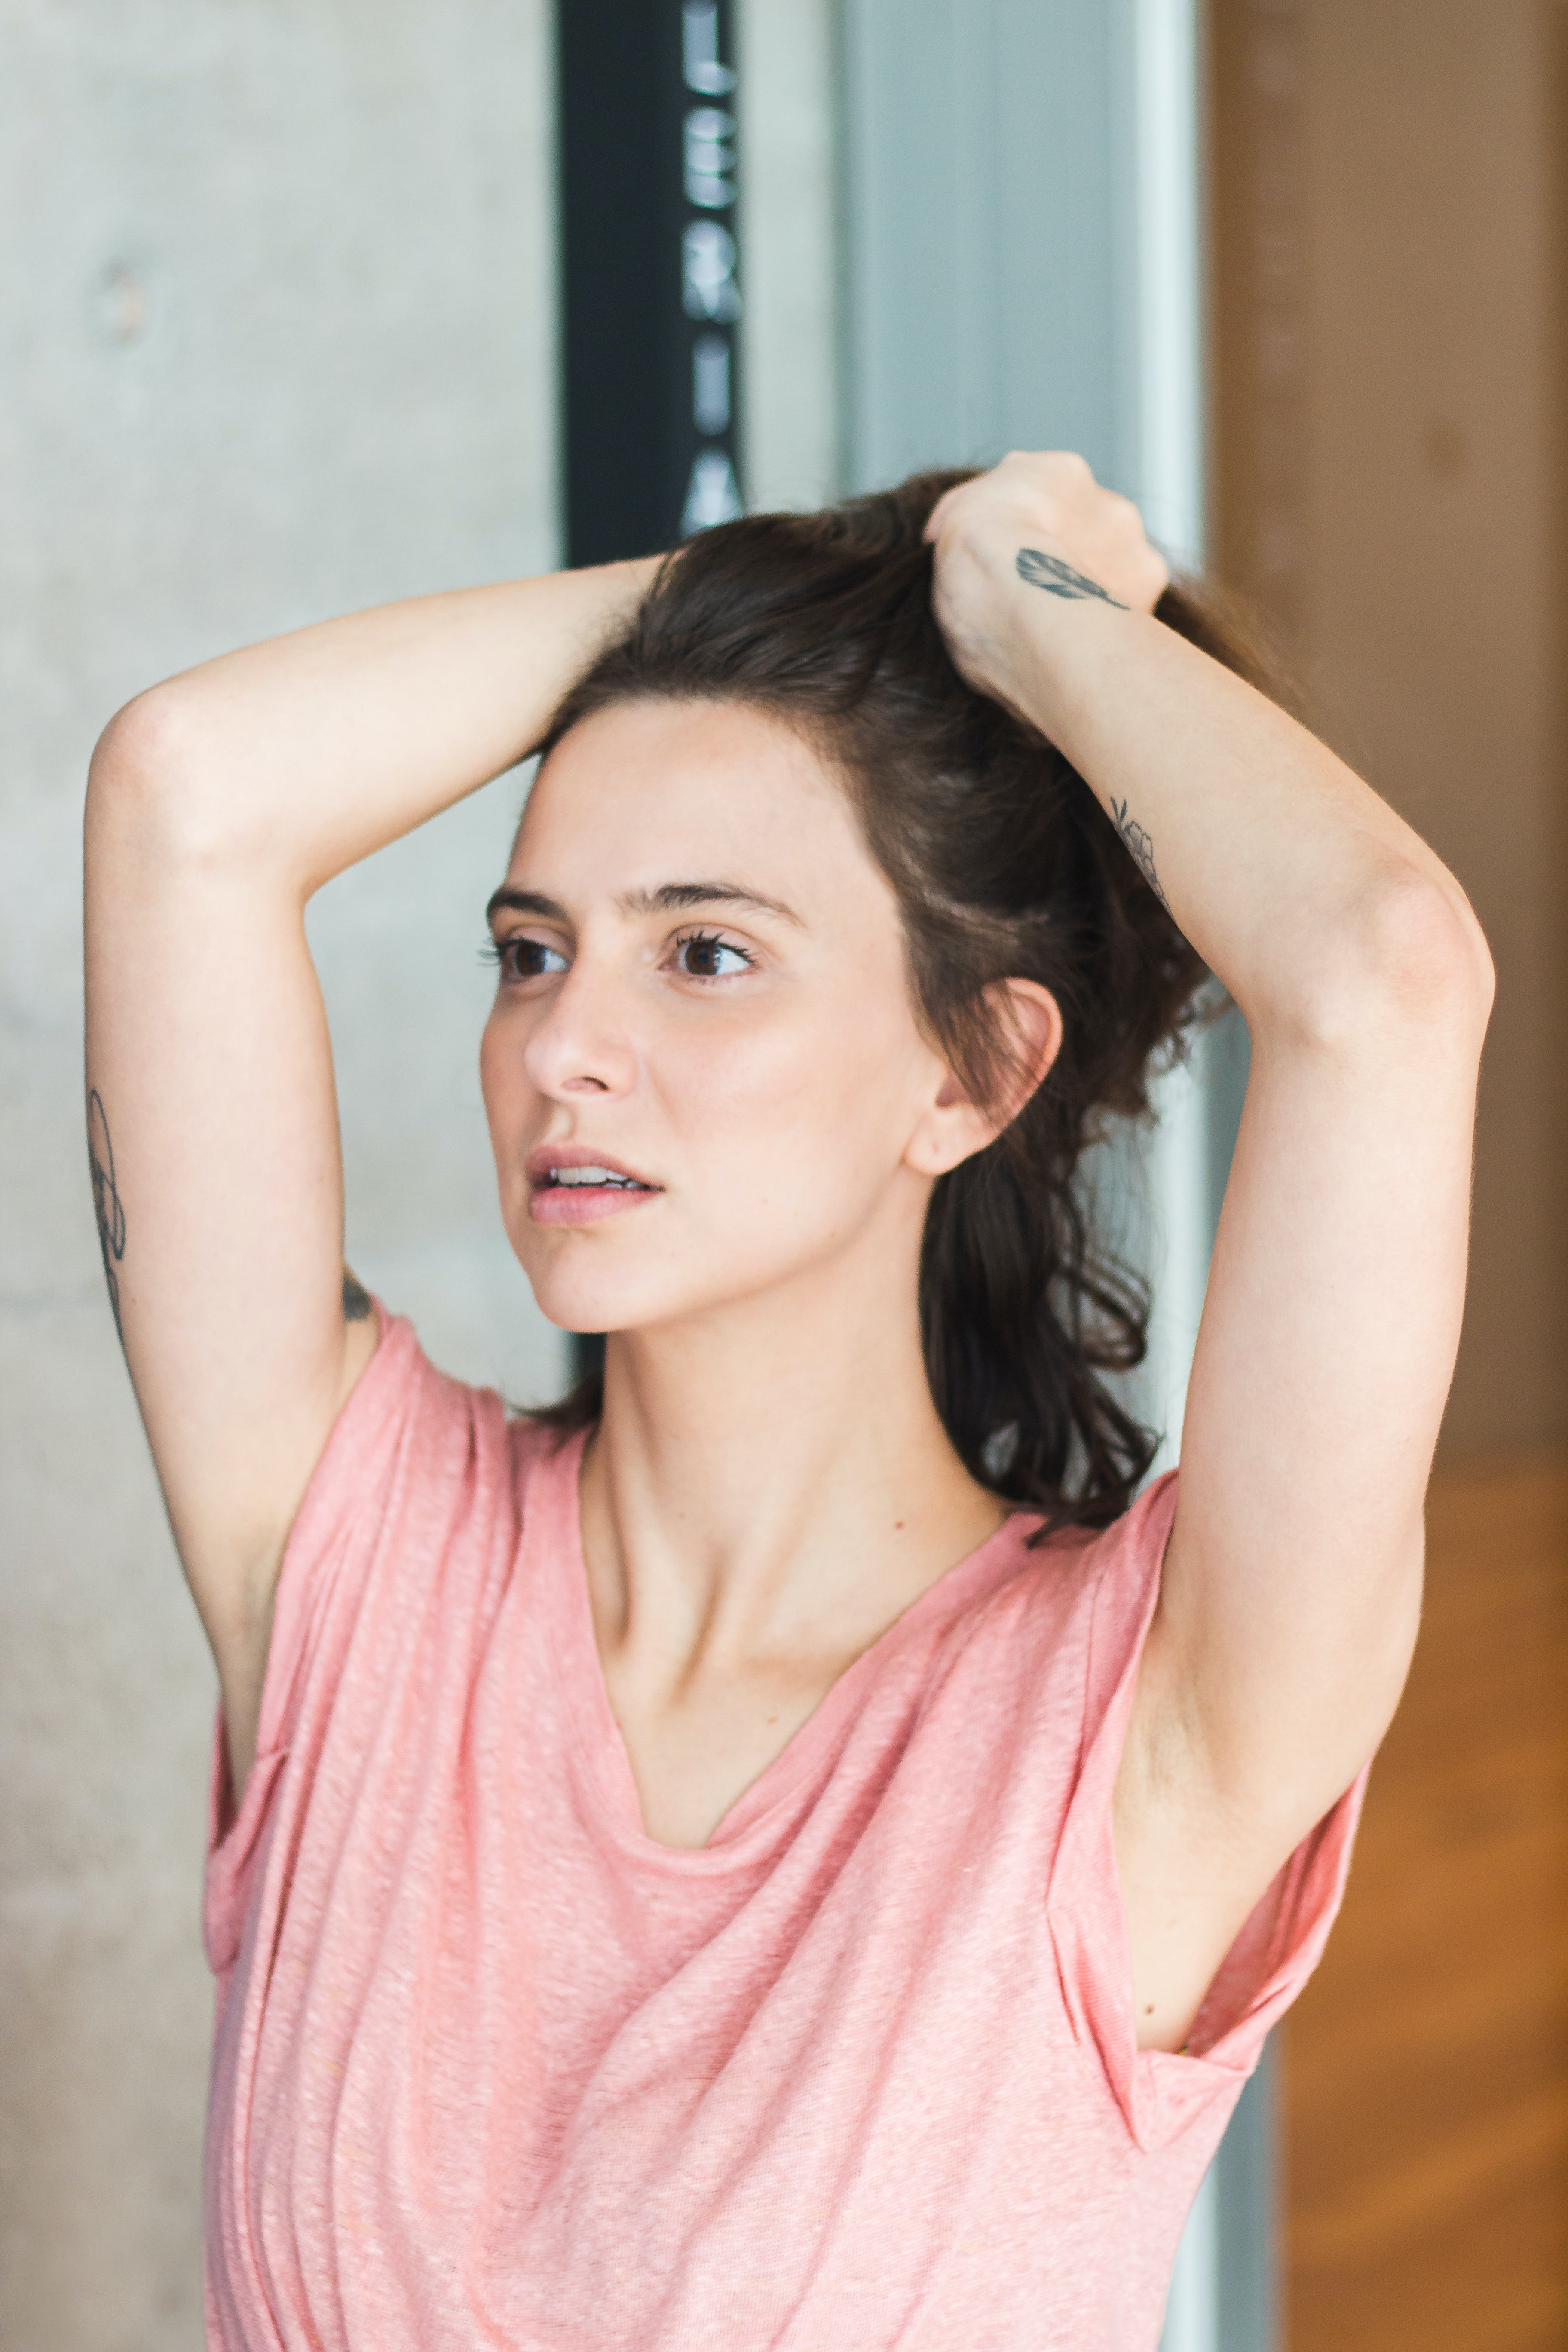 Woman Holding Her Hair Posing